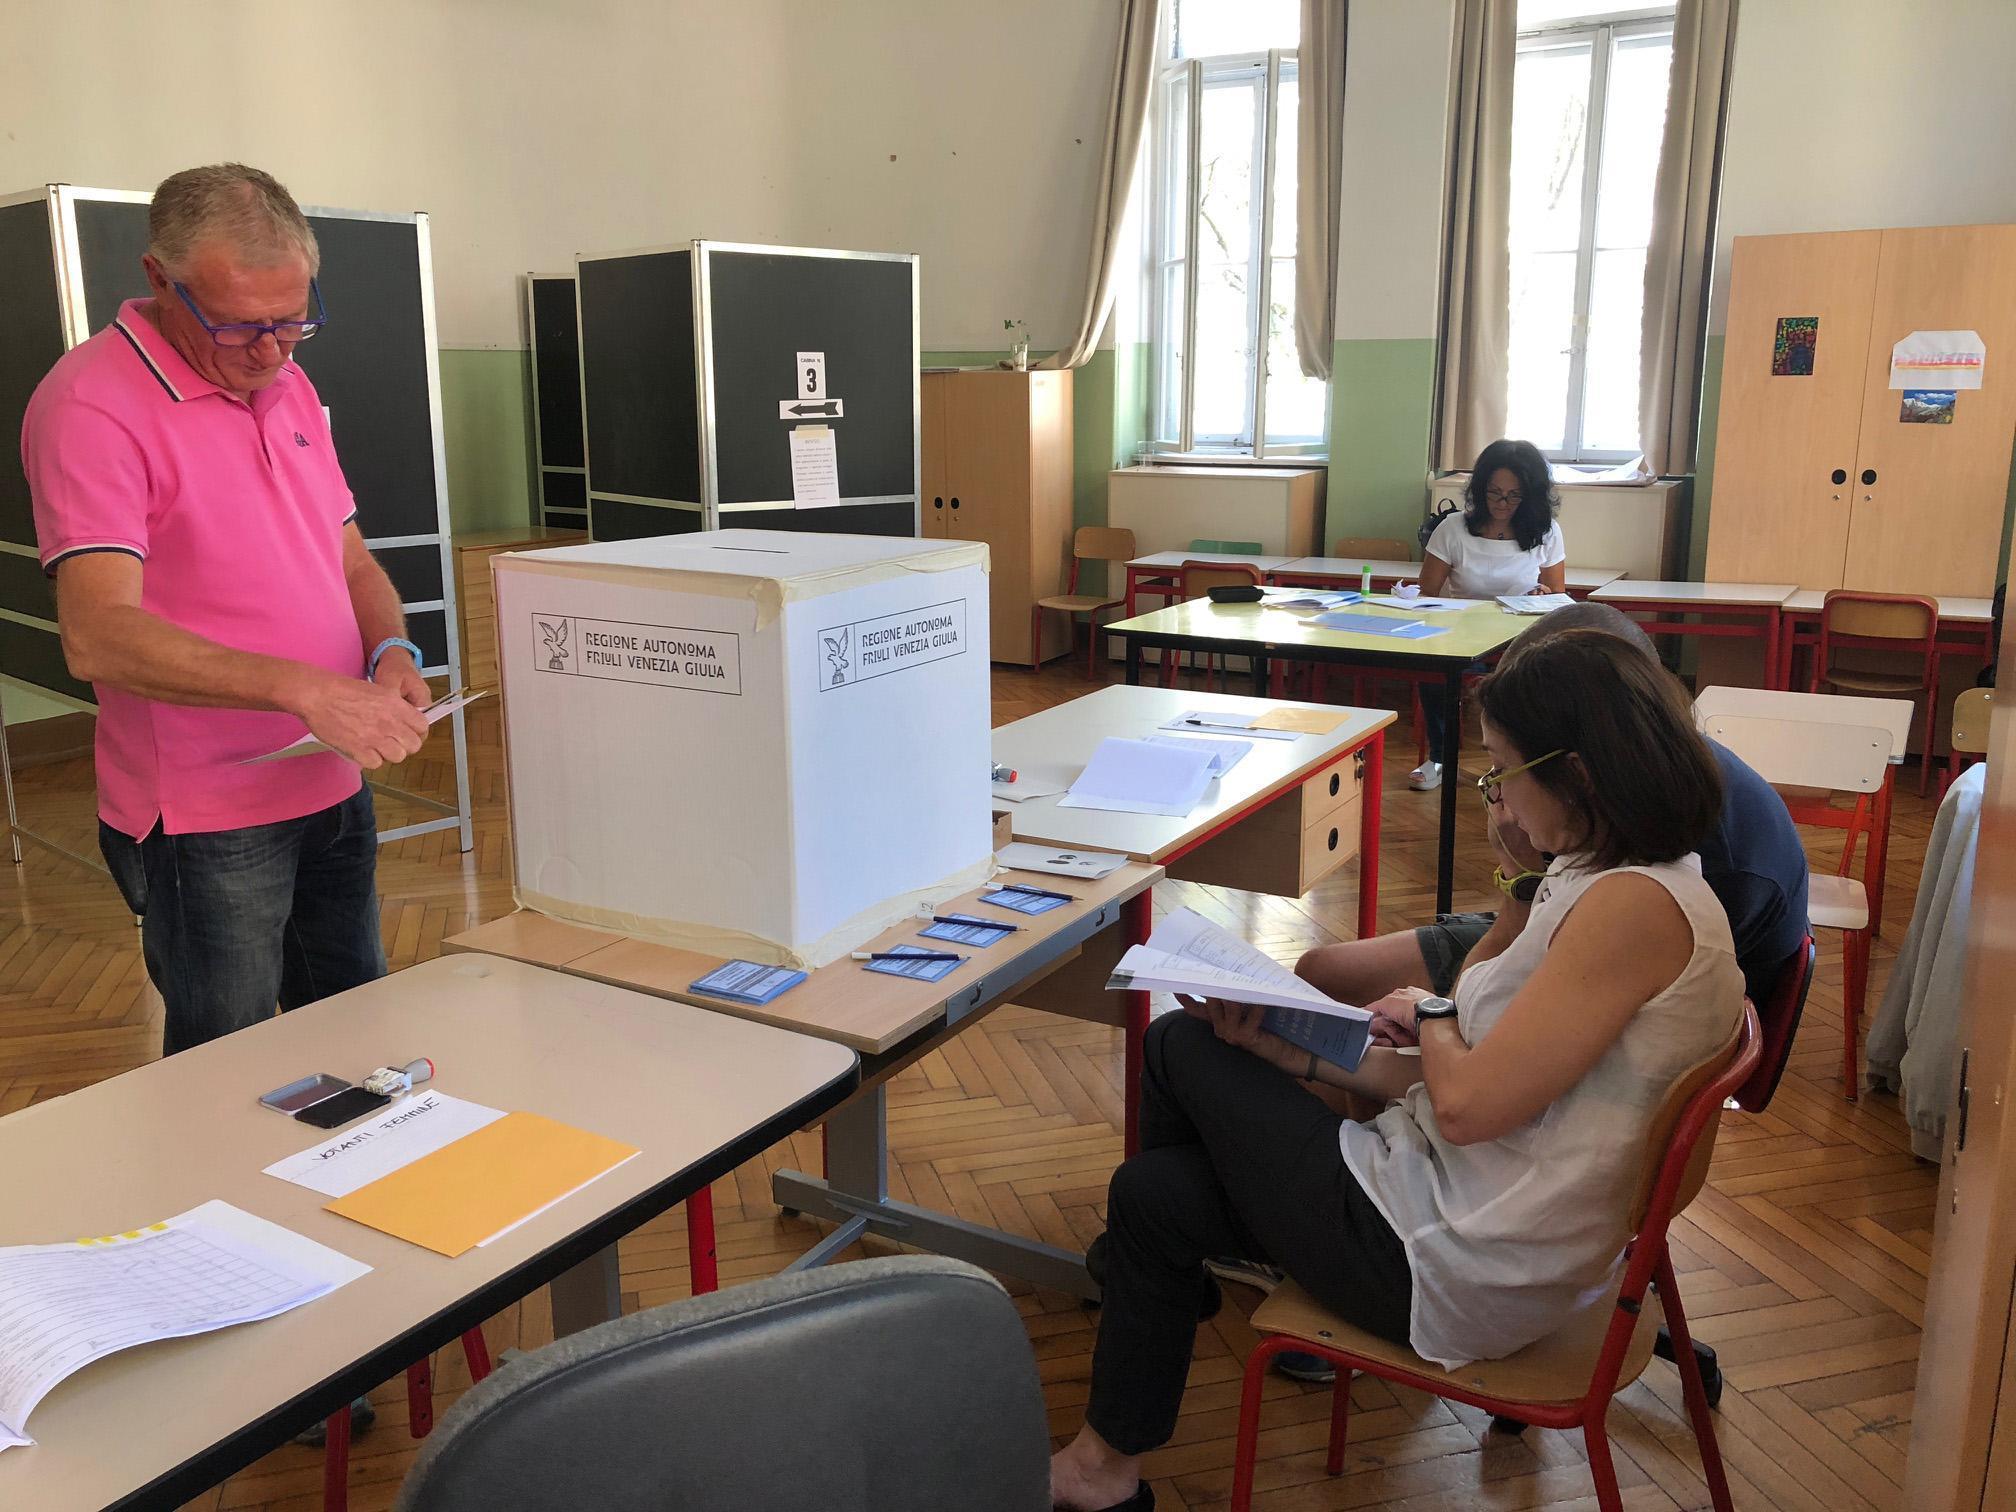 L'emorragia di voti M5S in Friuli Venezia Giulia